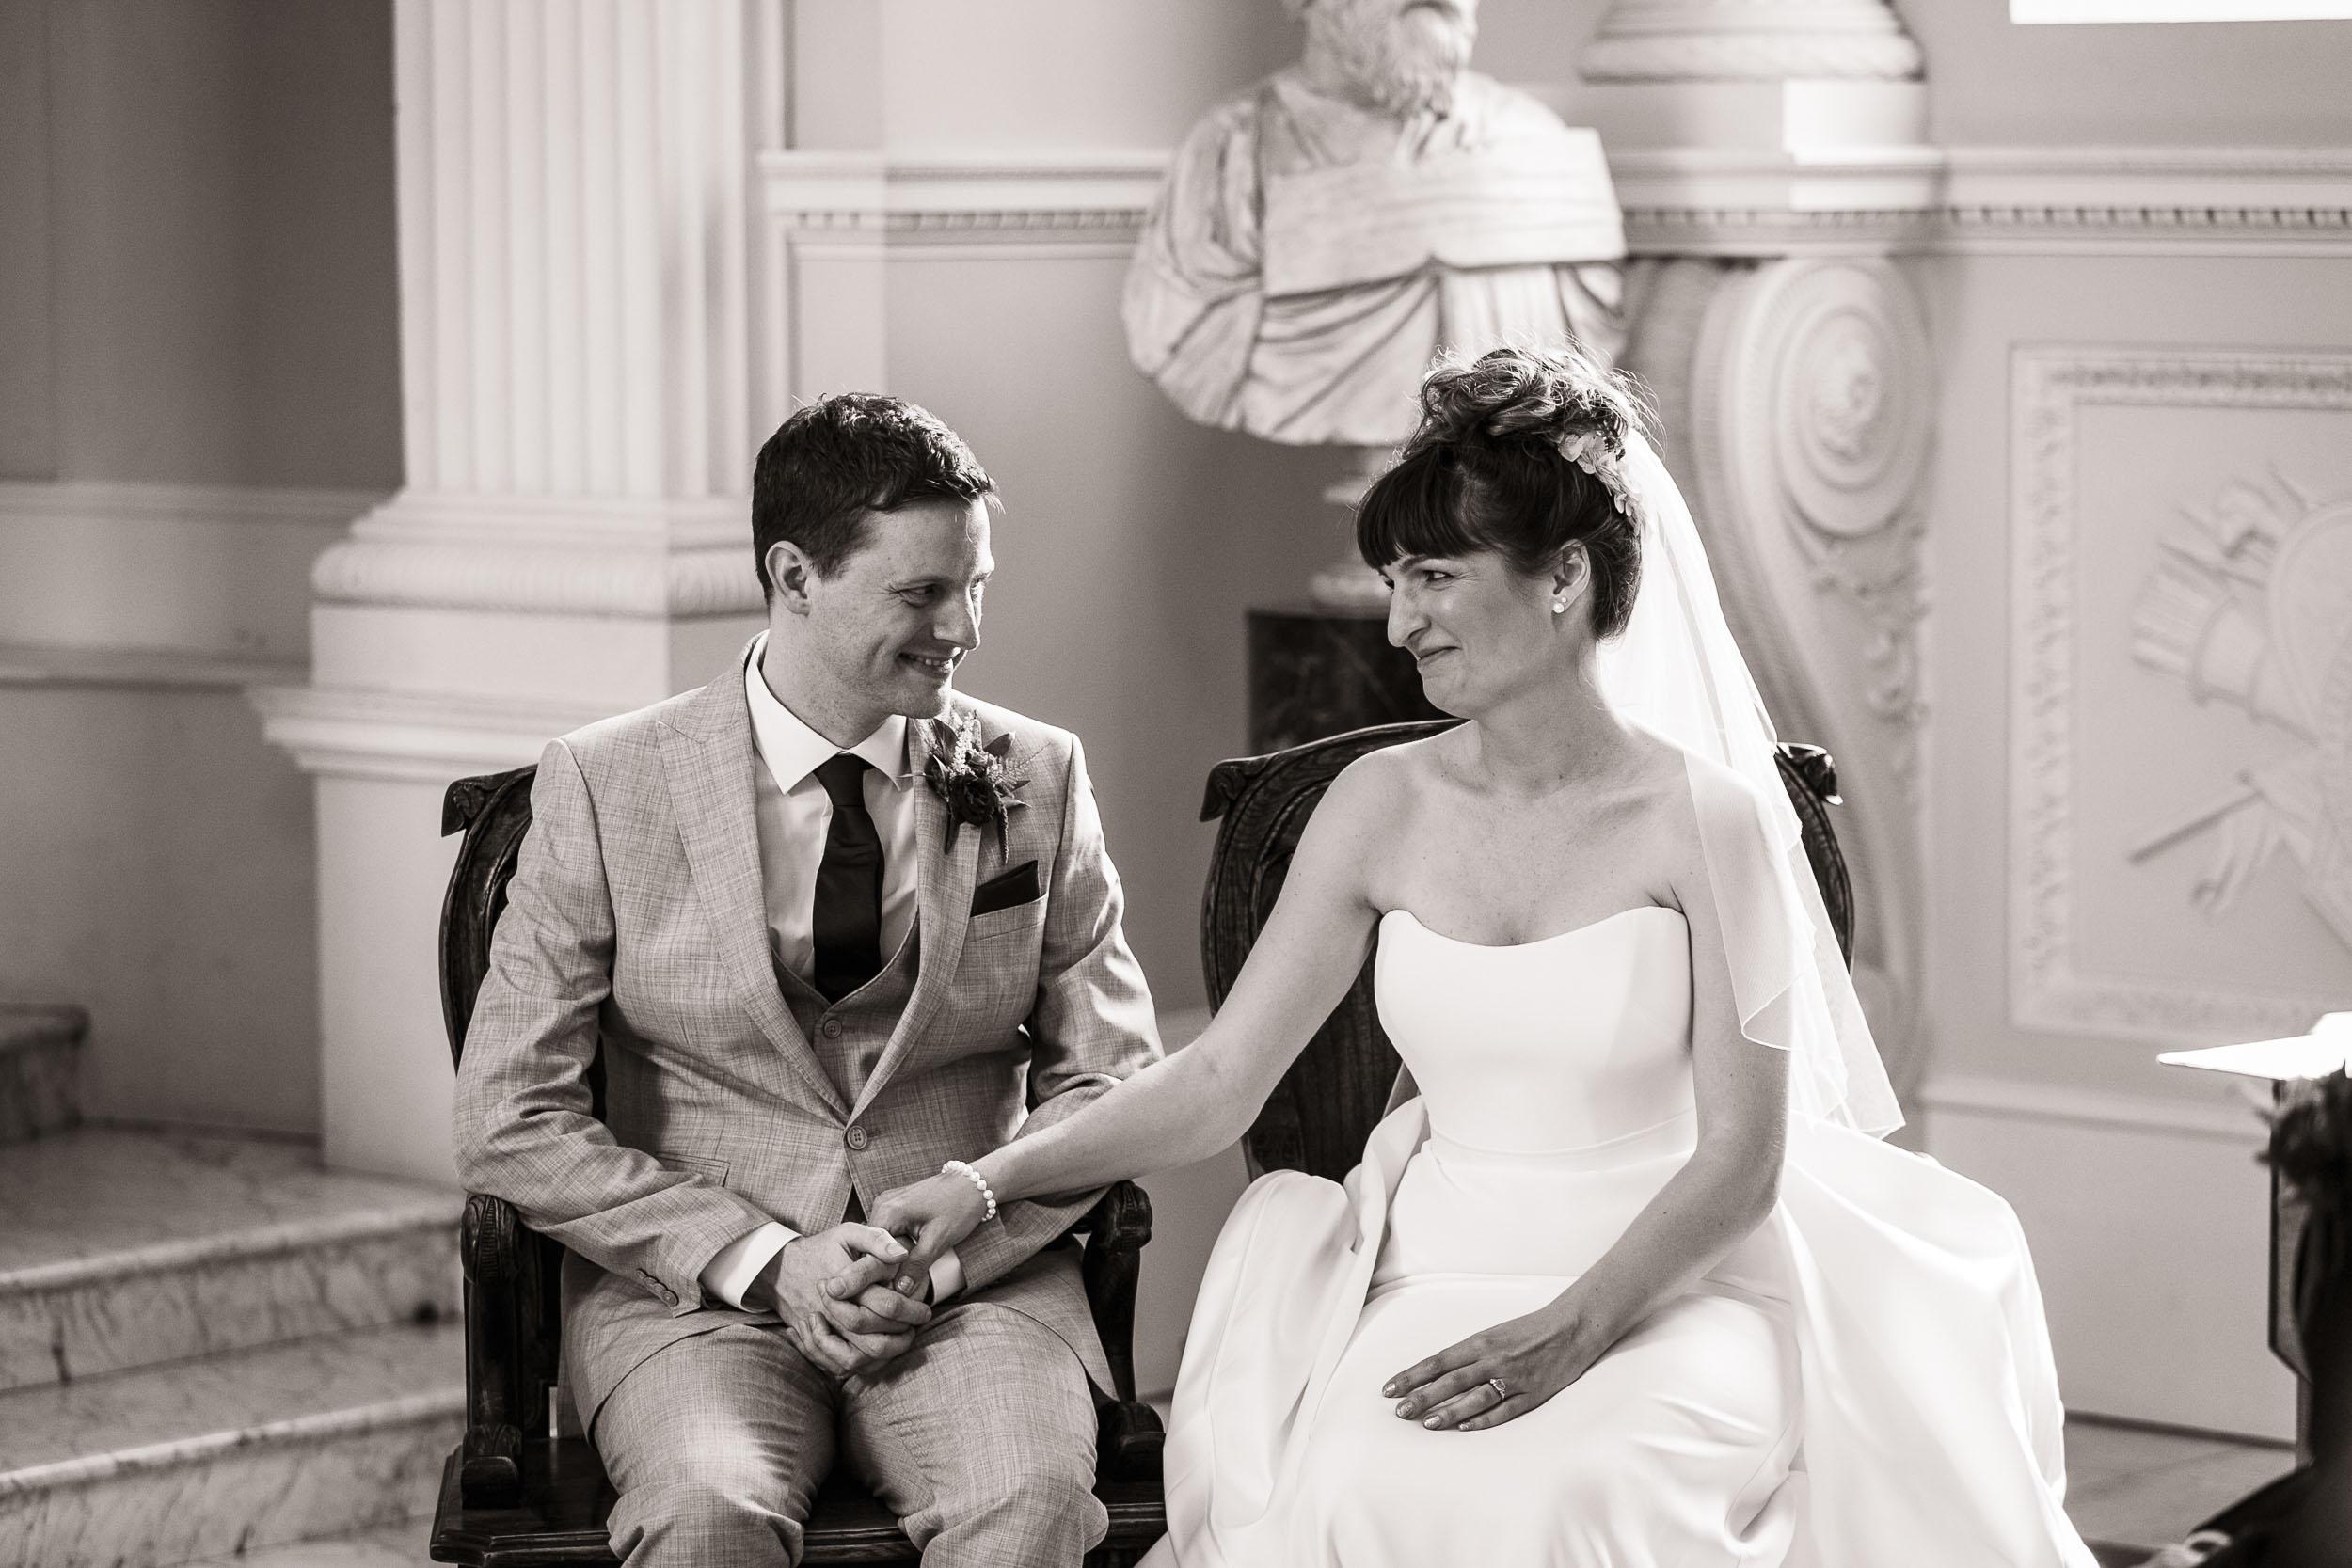 syon-house-wedding-photographer-london 053.jpg